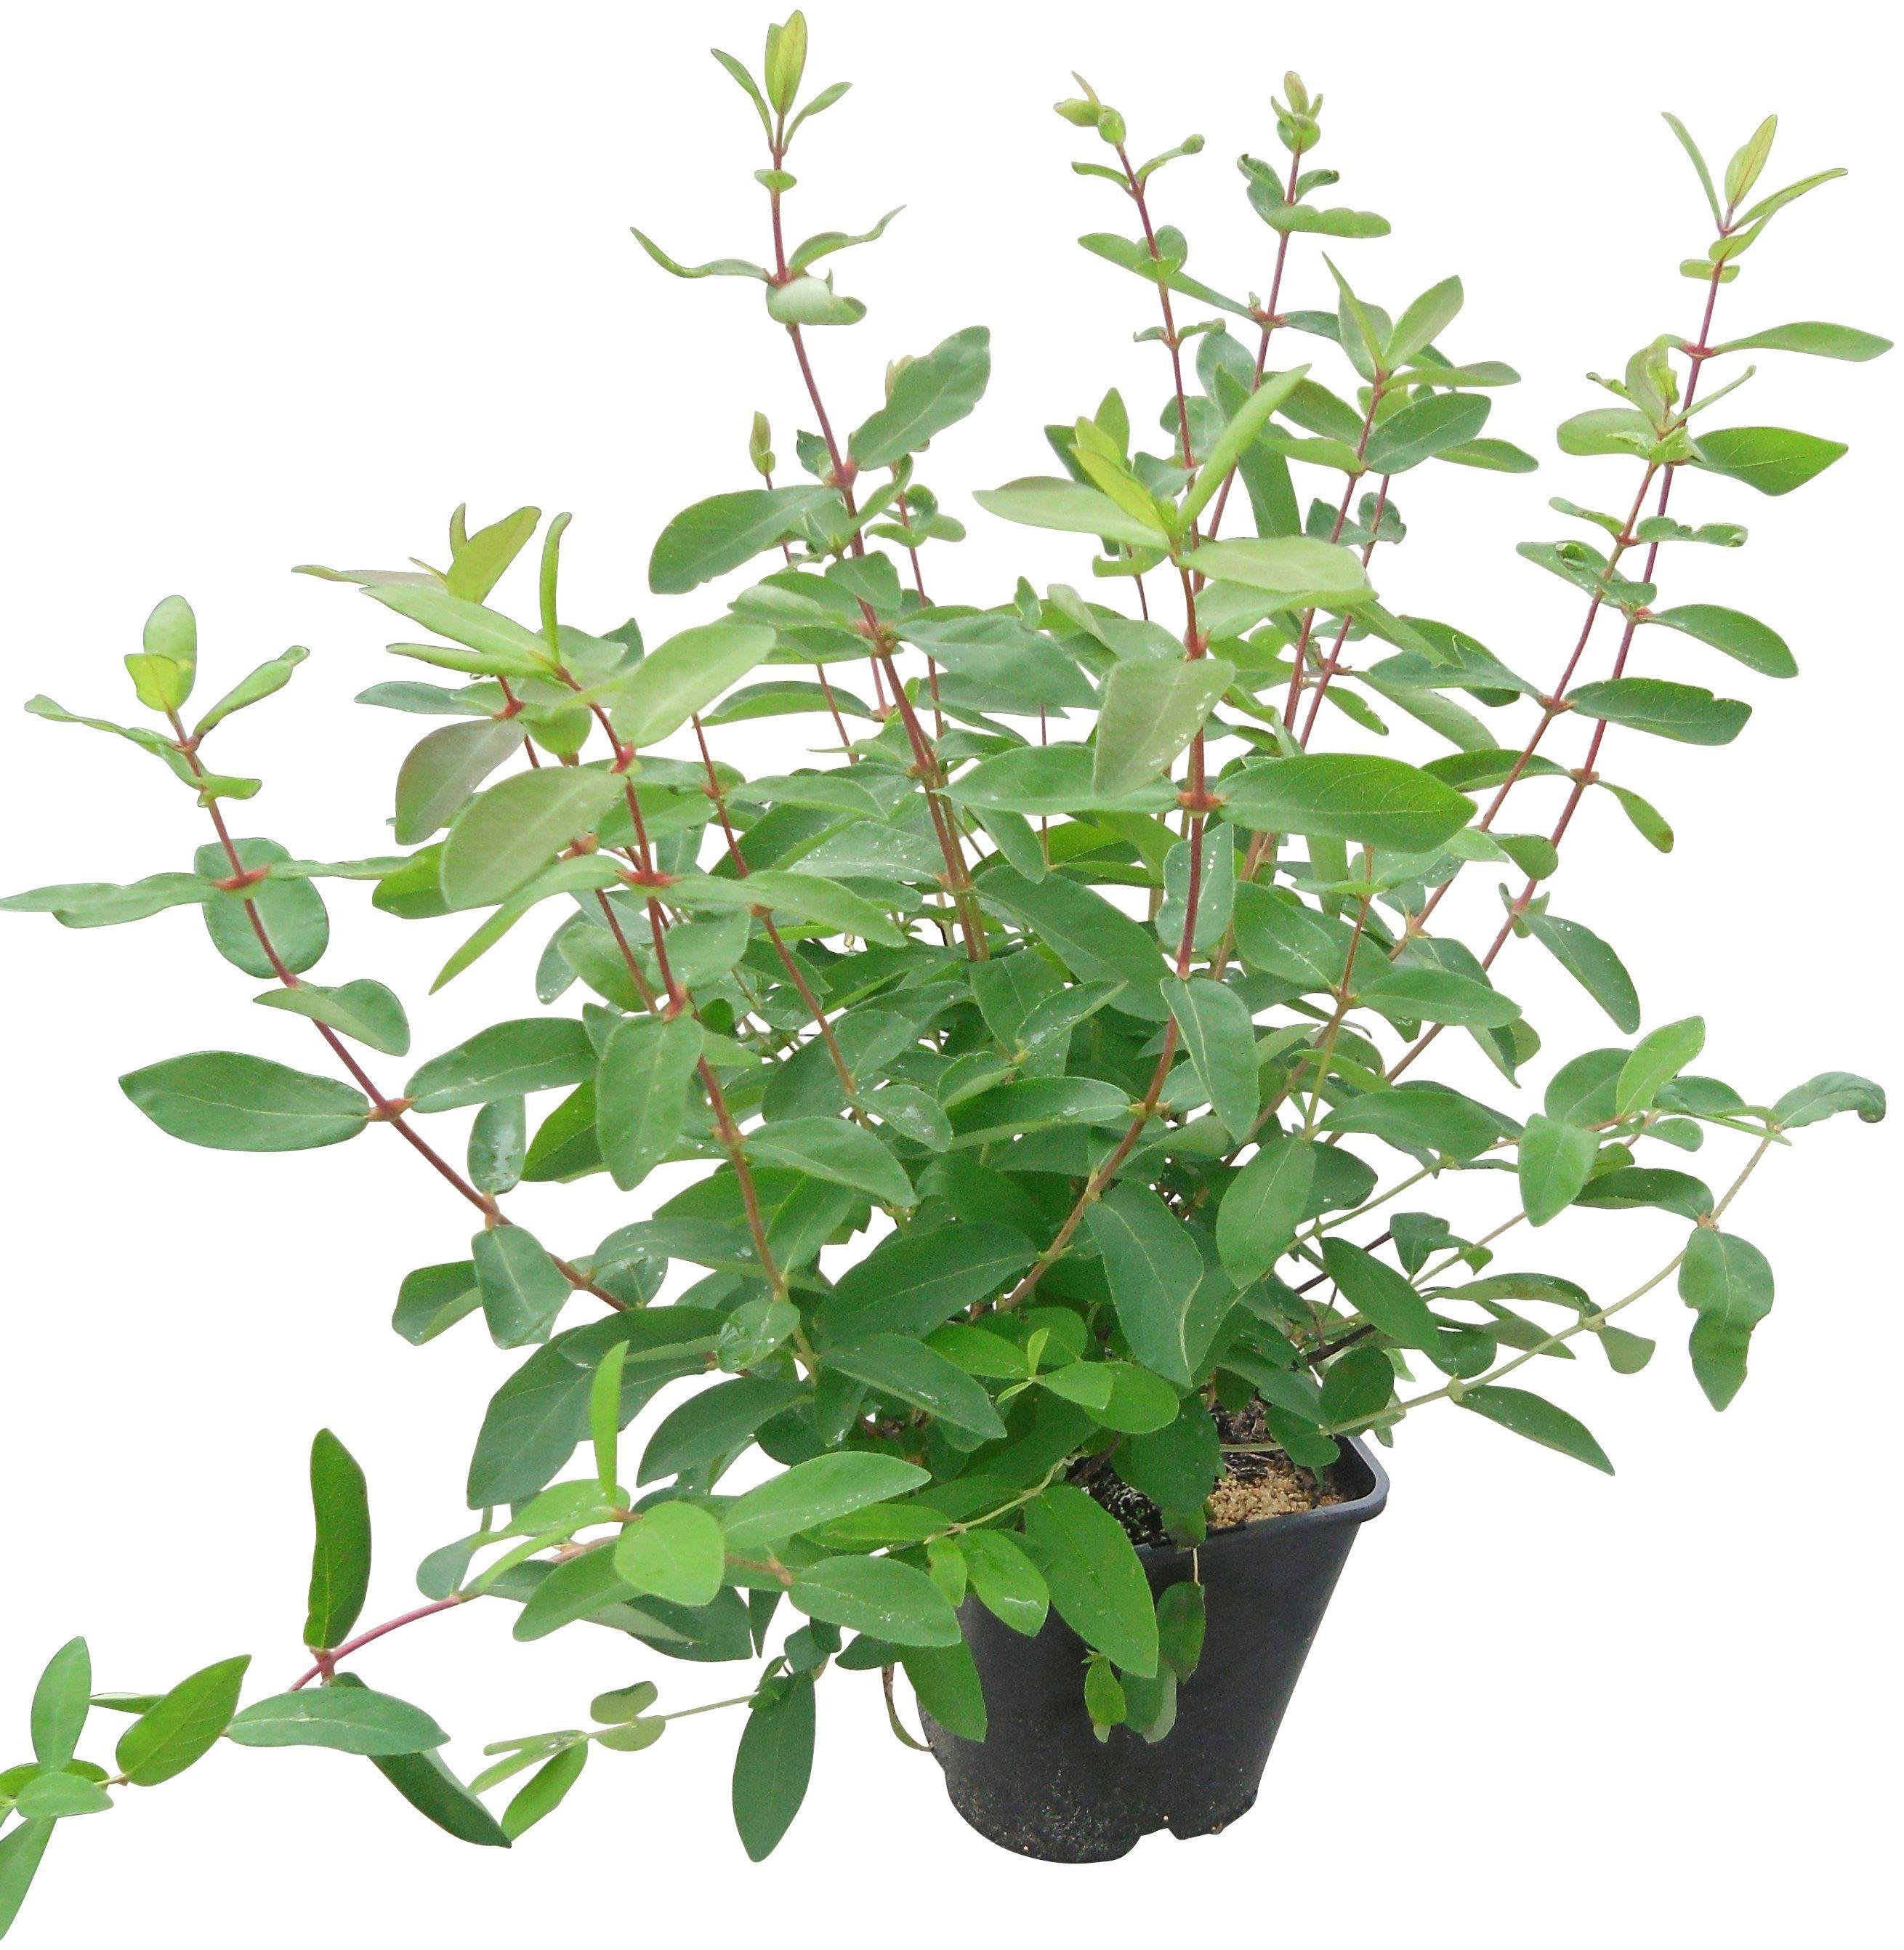 BCM Obst »Lonicera kamtschatica 'Bienenzauber'«, 1 Pflanze